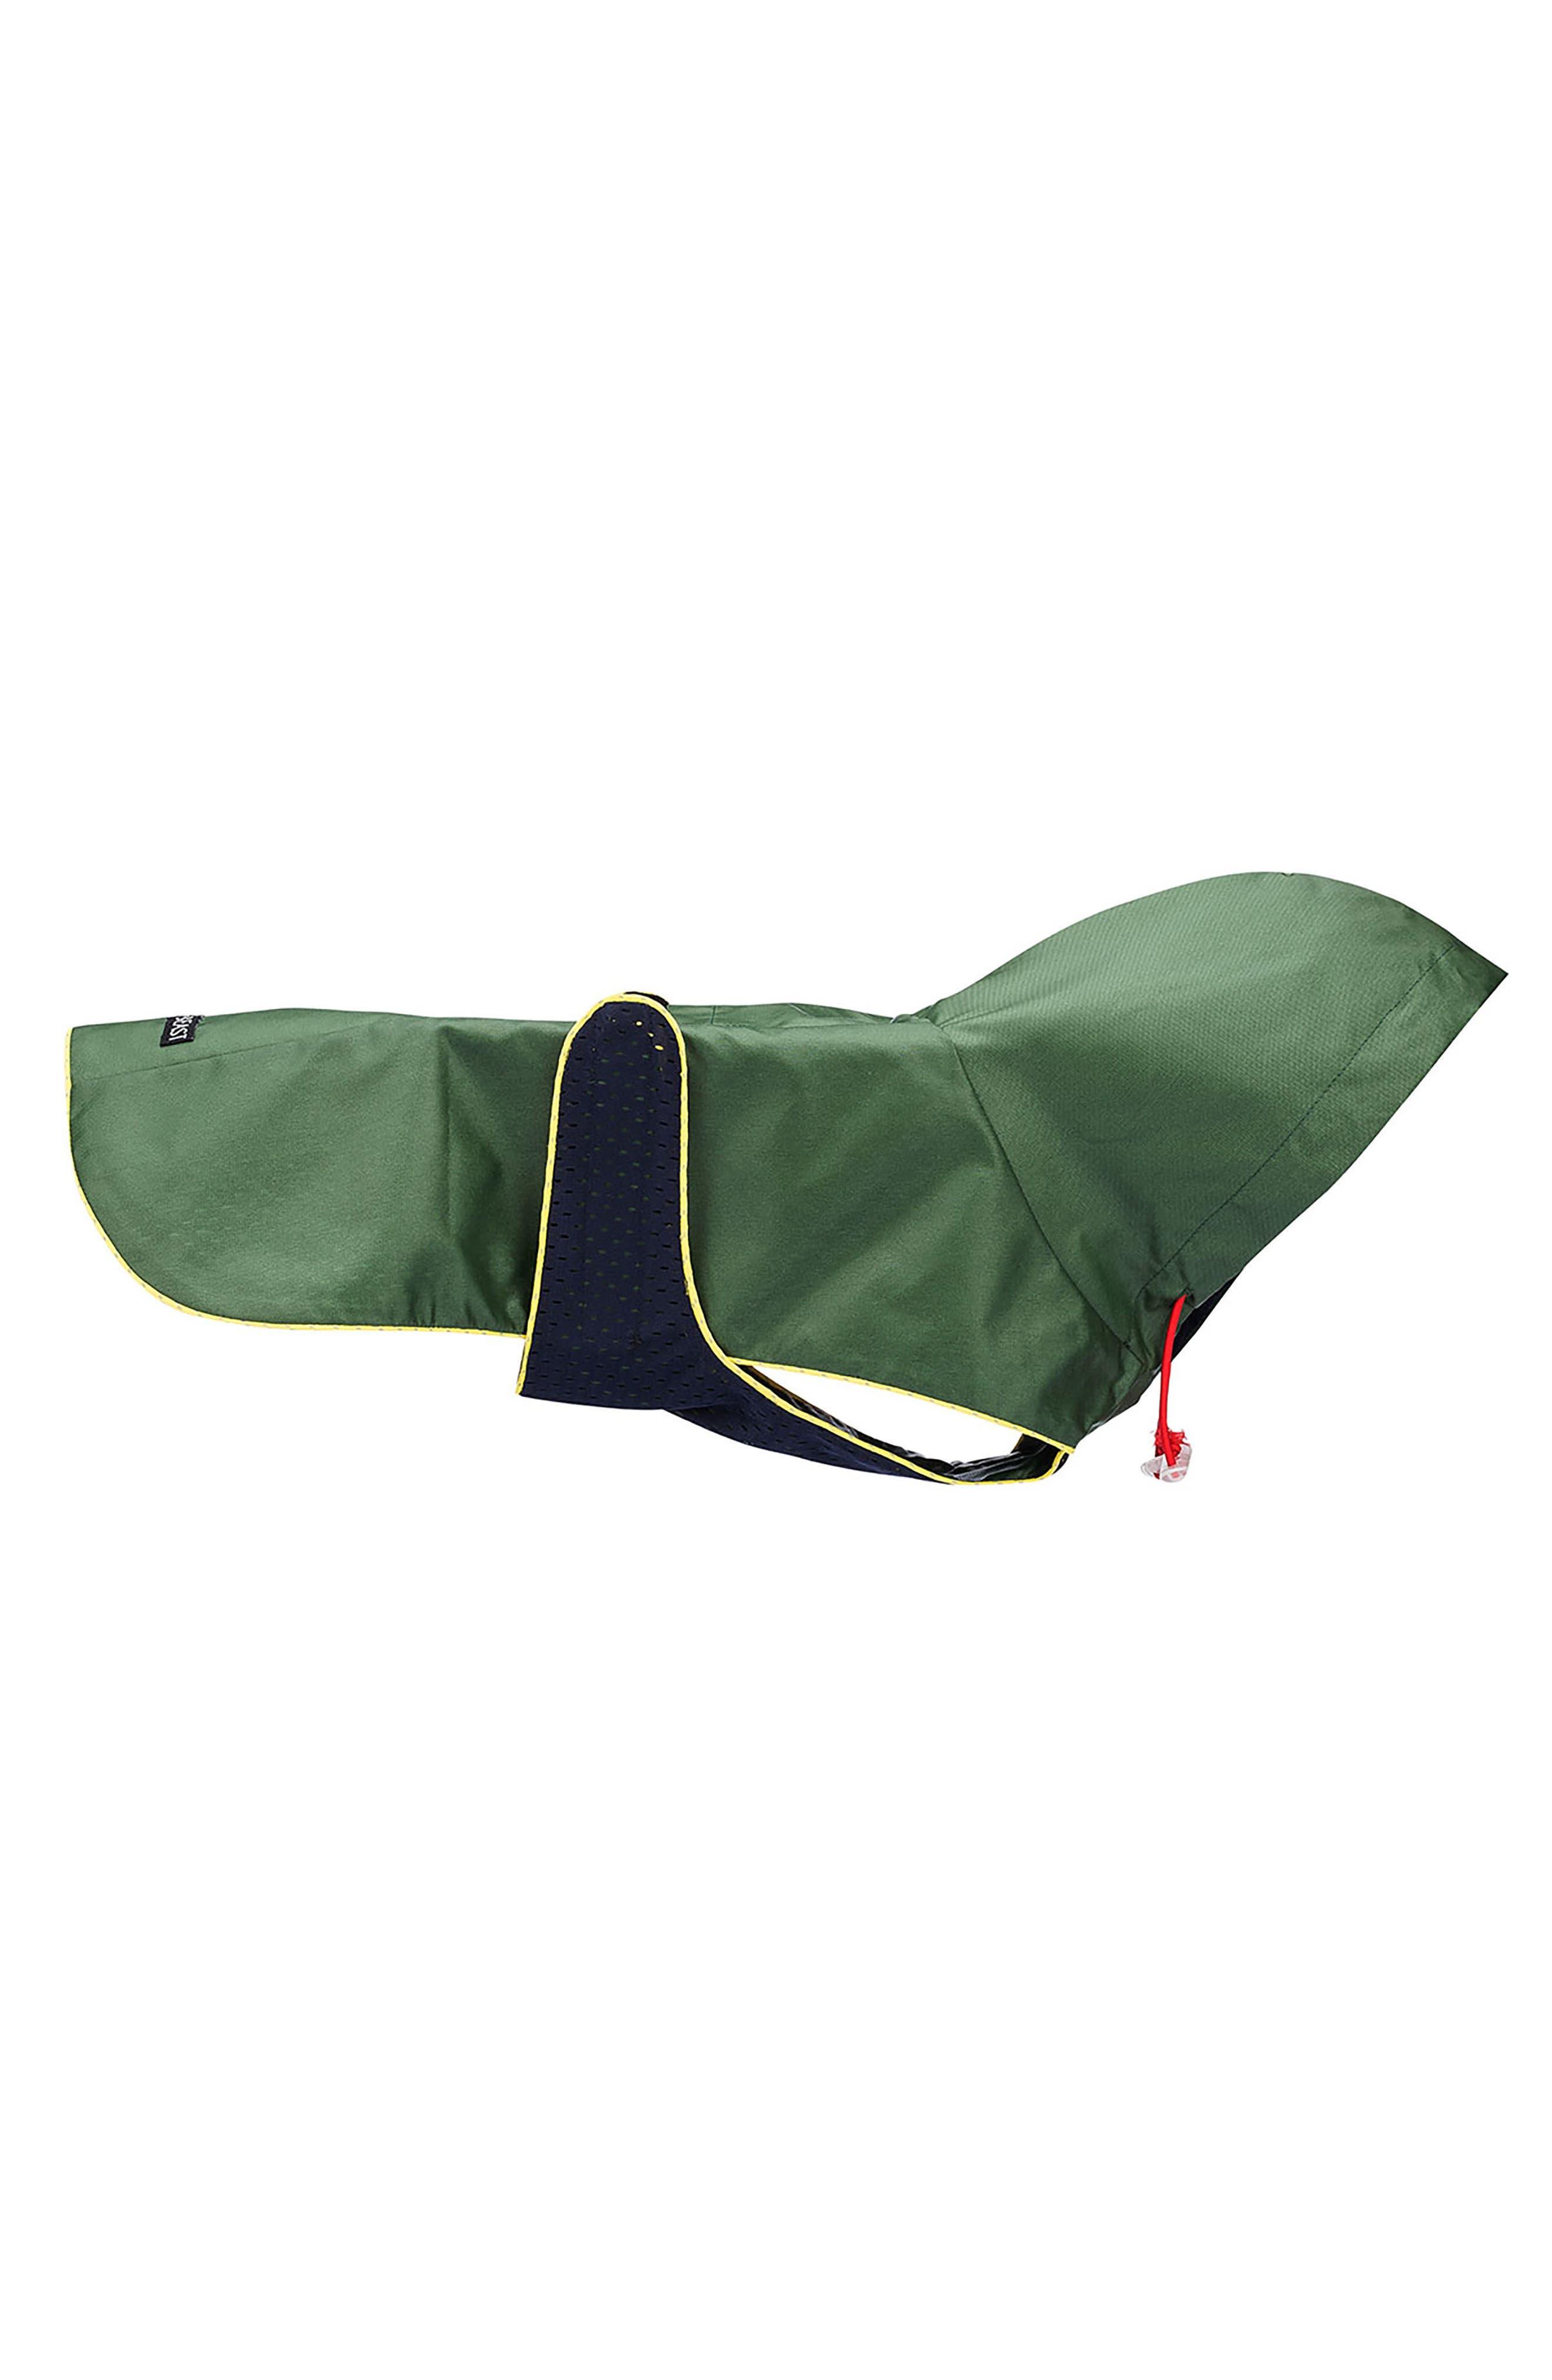 Dog Rain Jacket with Mesh Lining,                         Main,                         color, 300